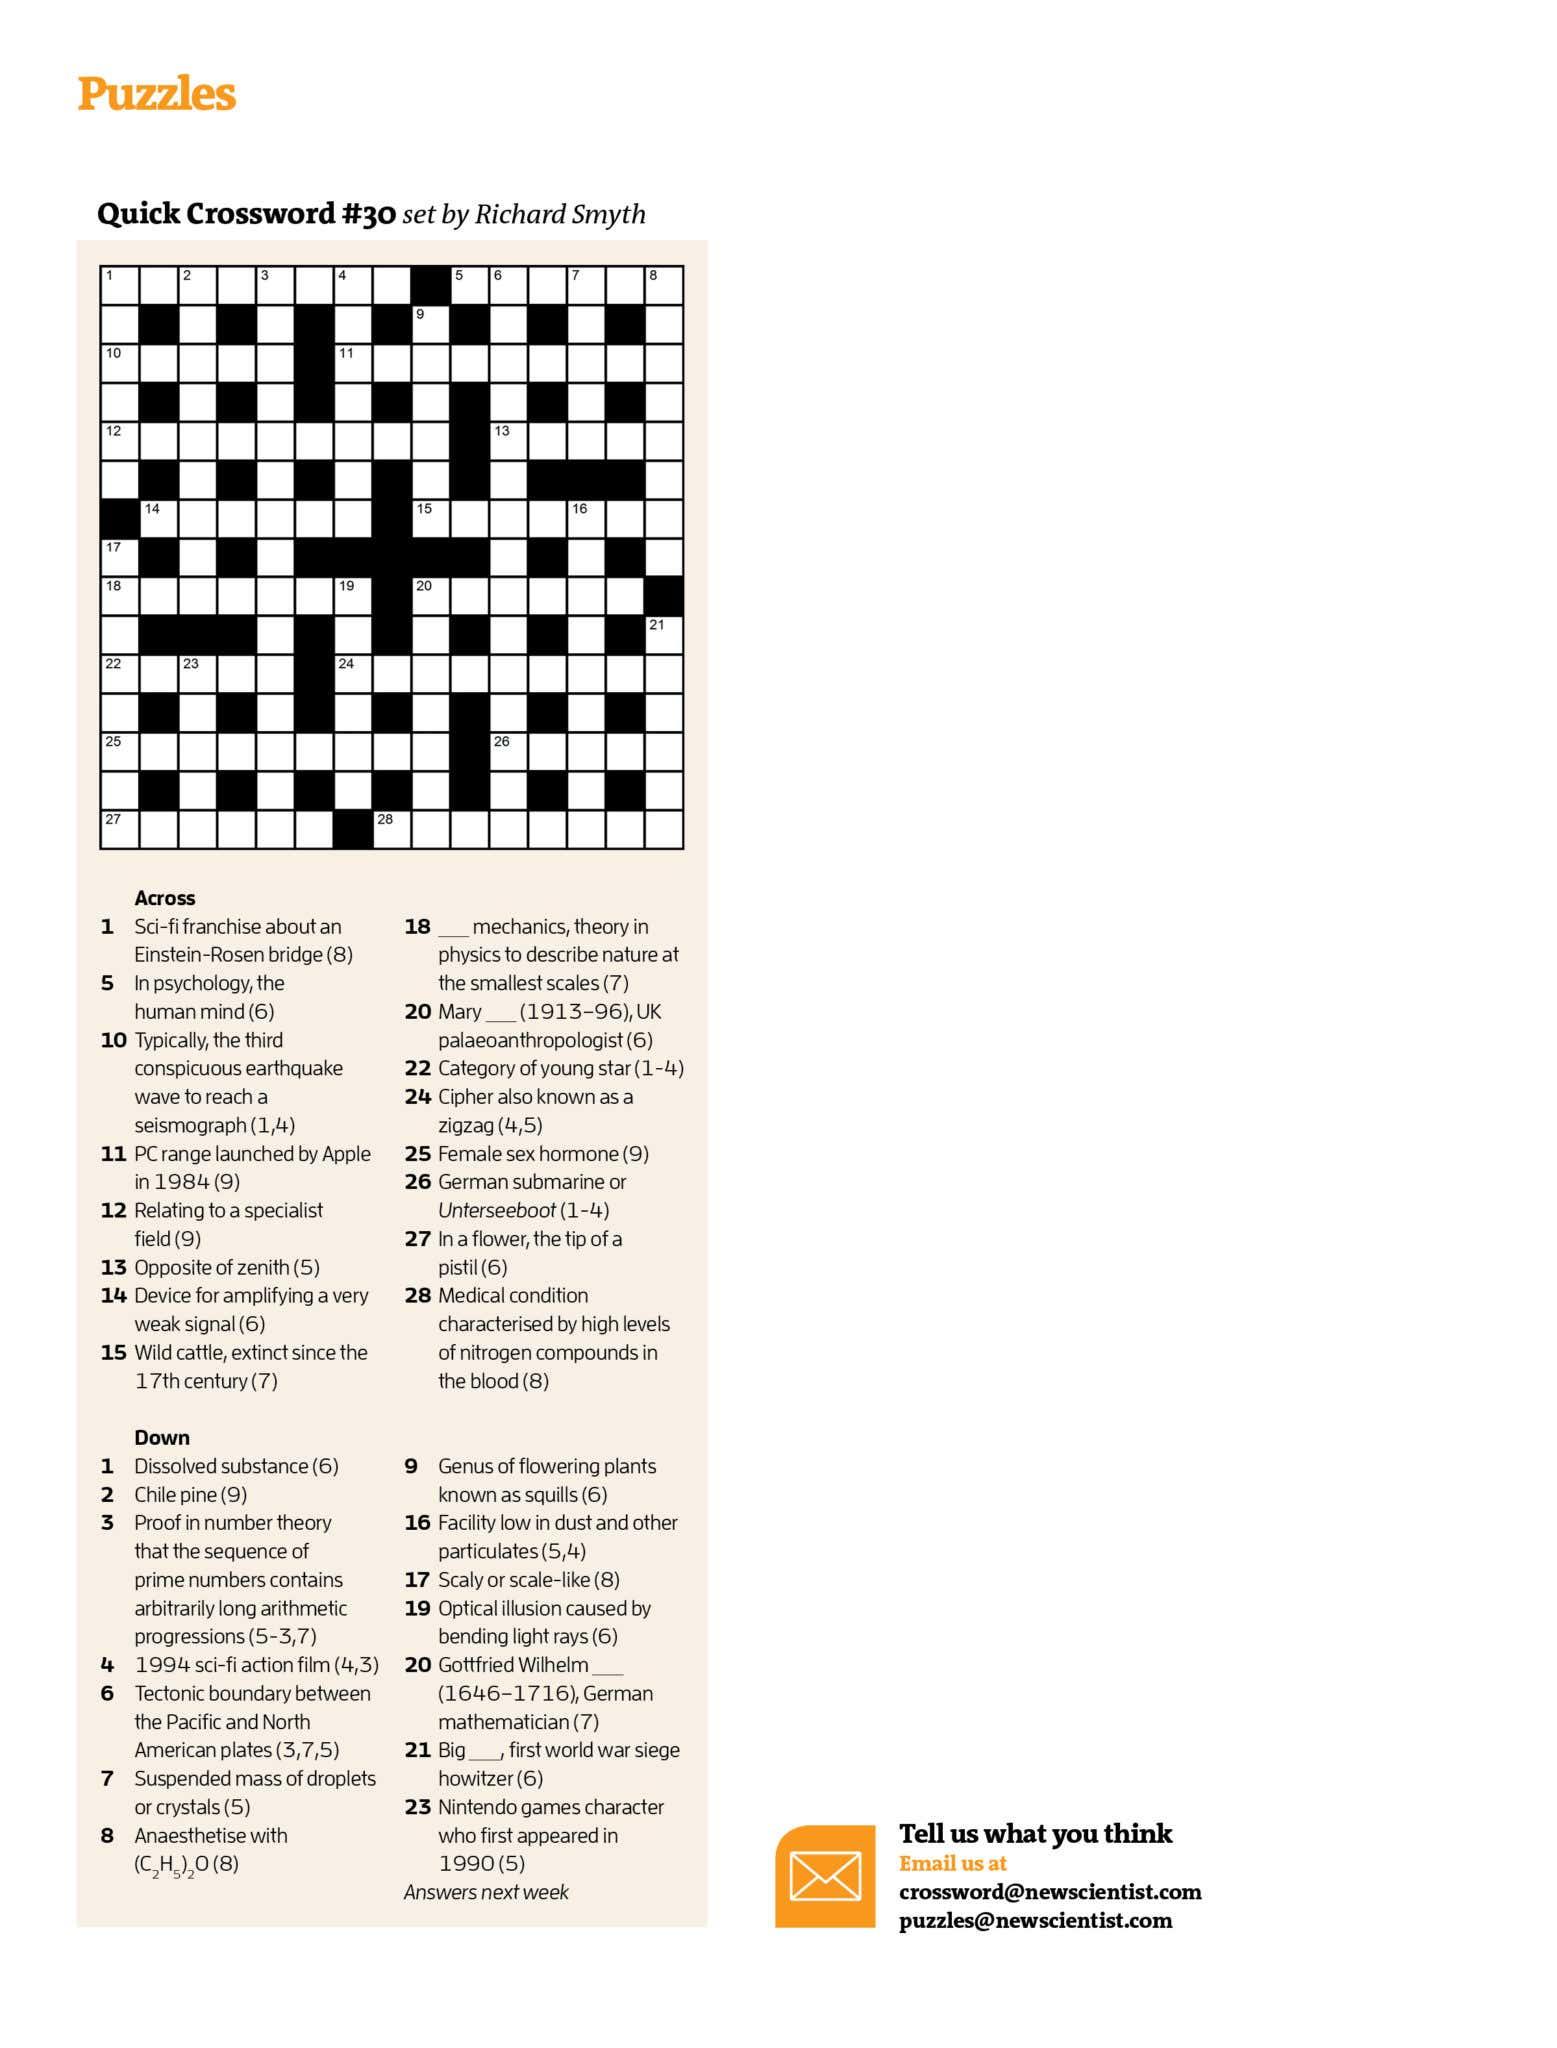 Quick Crossword #30   New Scientist - Daily Quick Crossword Printable Version